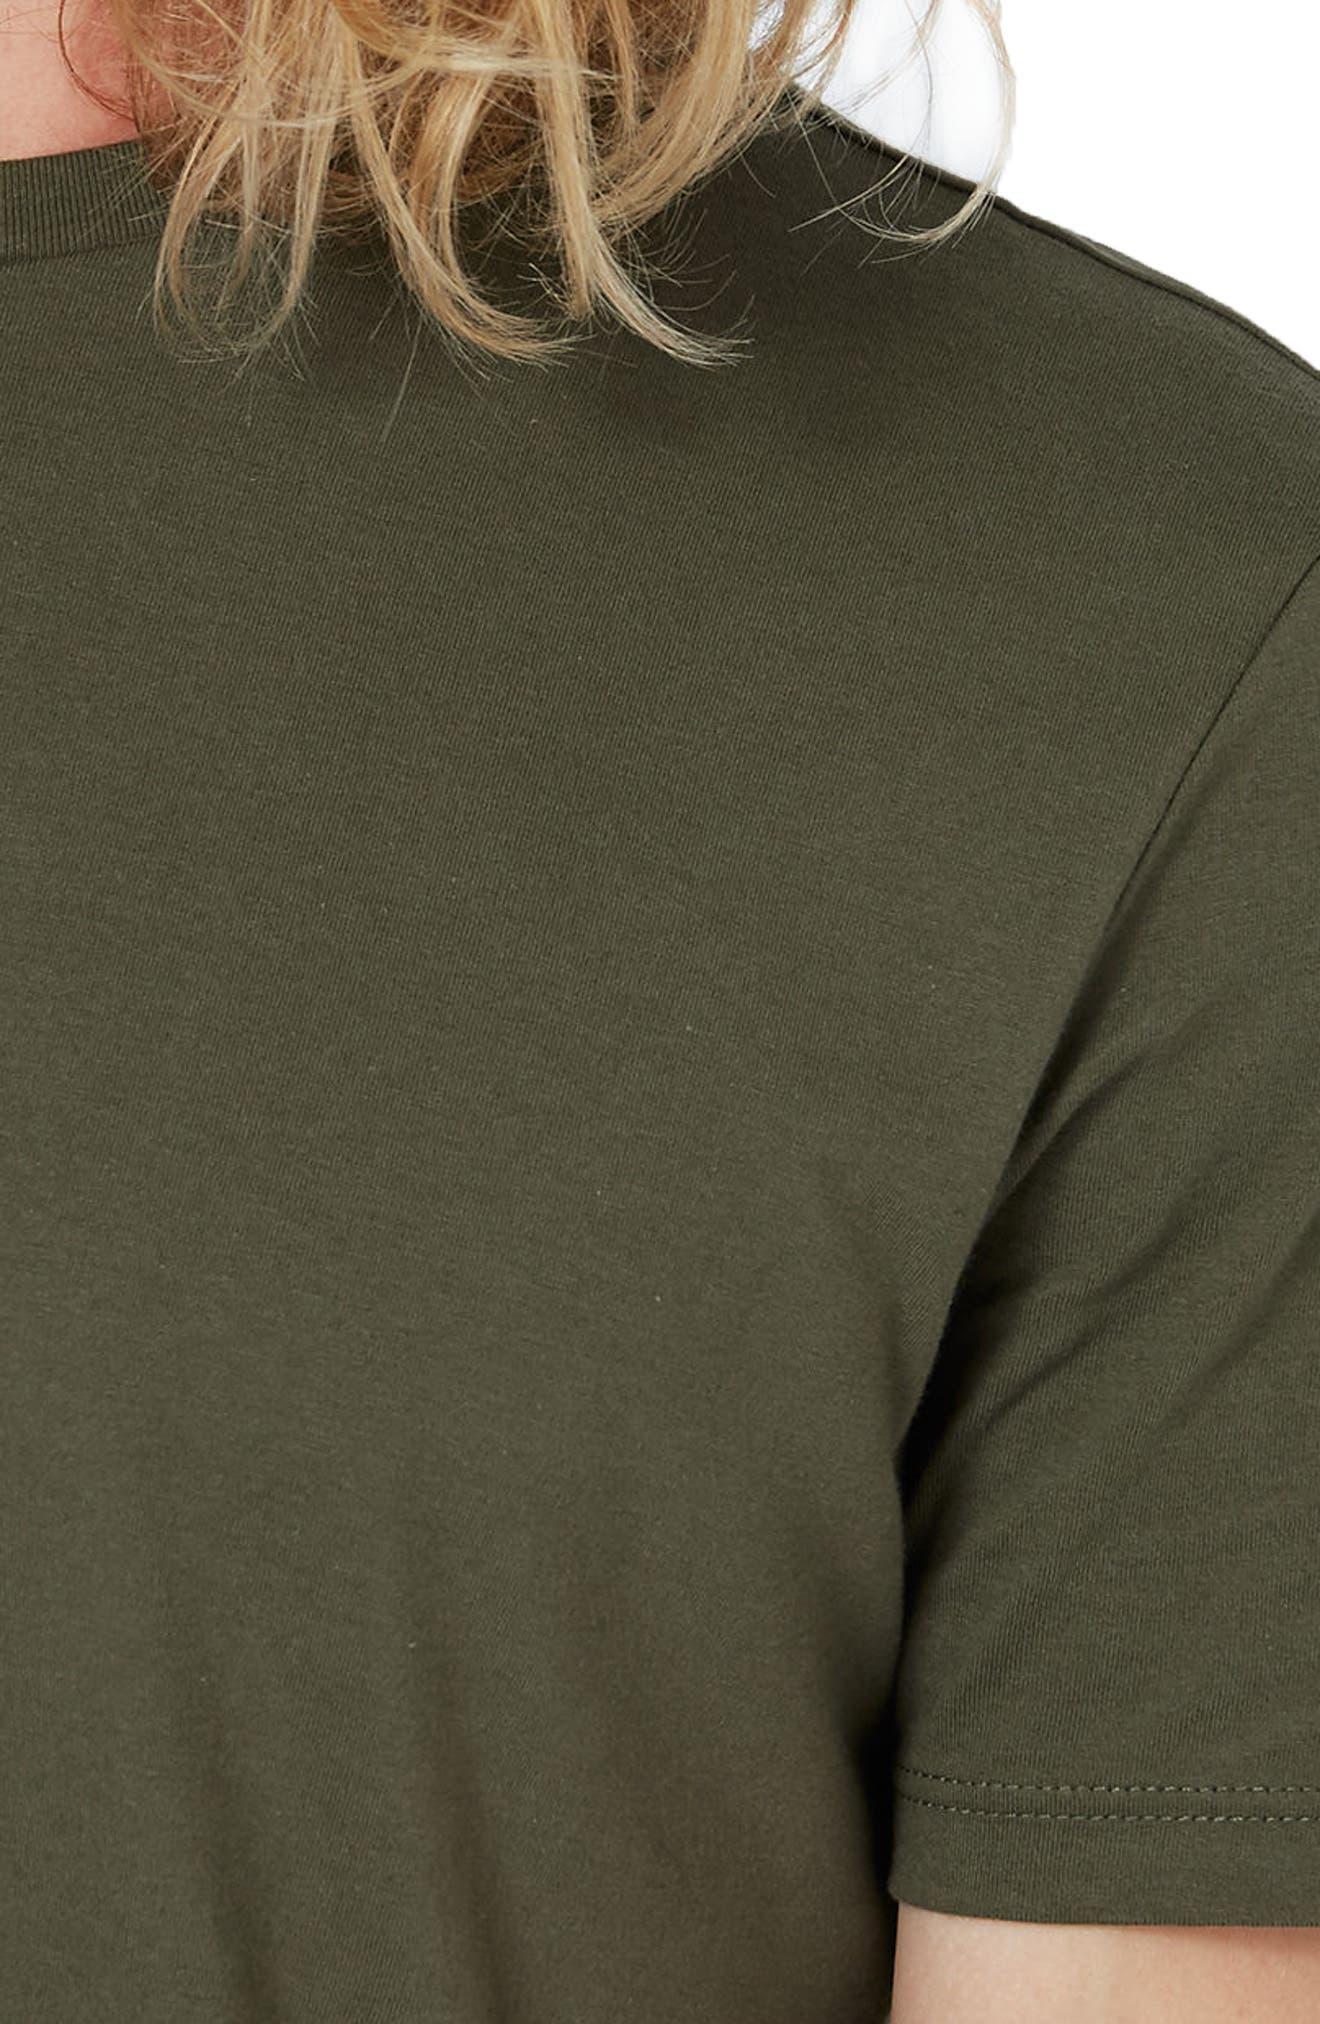 Slim Fit Crewneck T-Shirt,                             Alternate thumbnail 333, color,